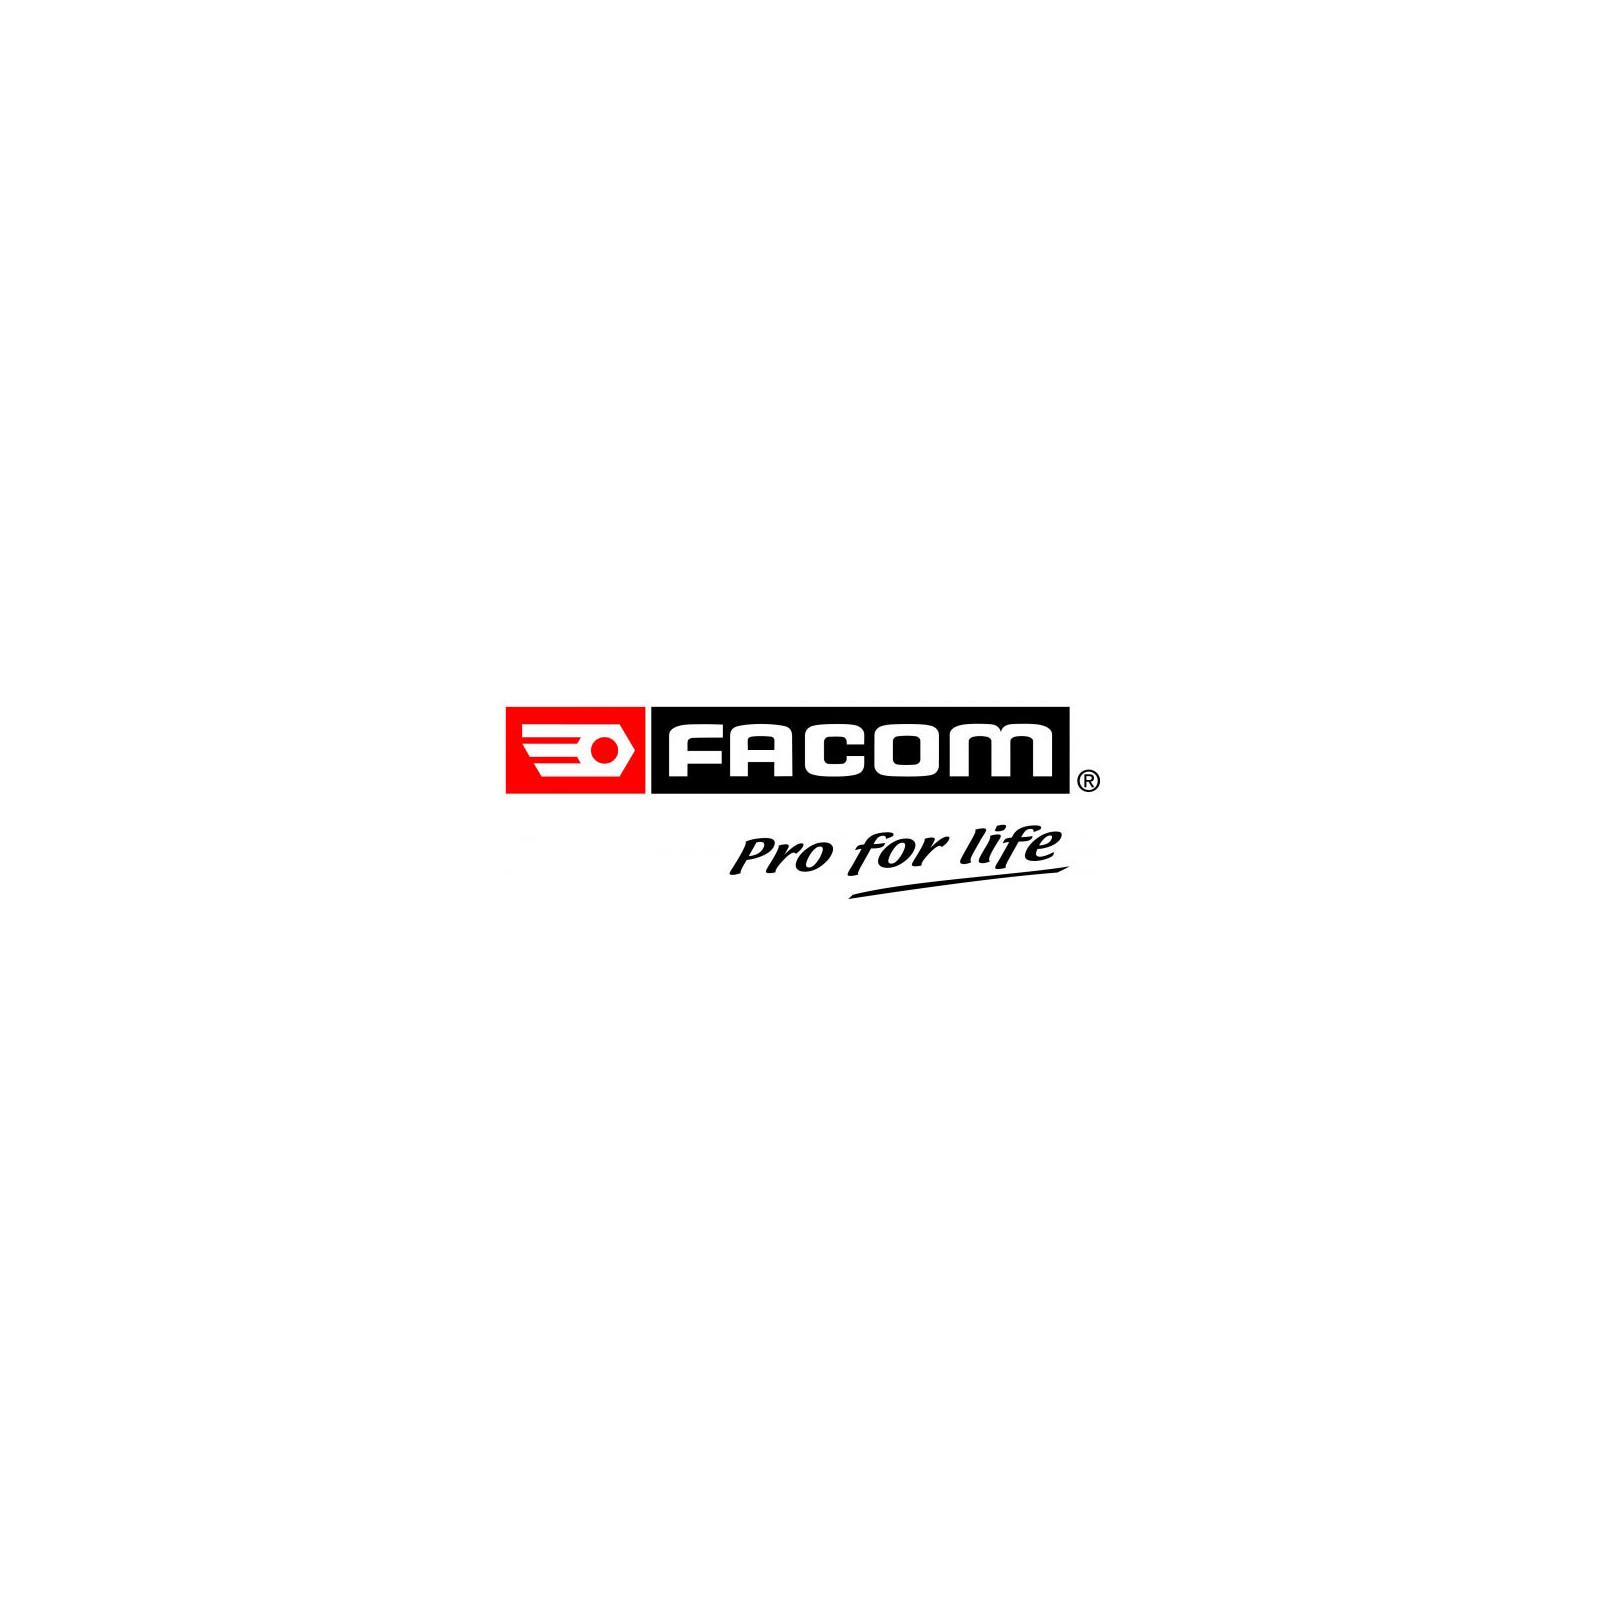 Ens.reparation - Facom 500.RN